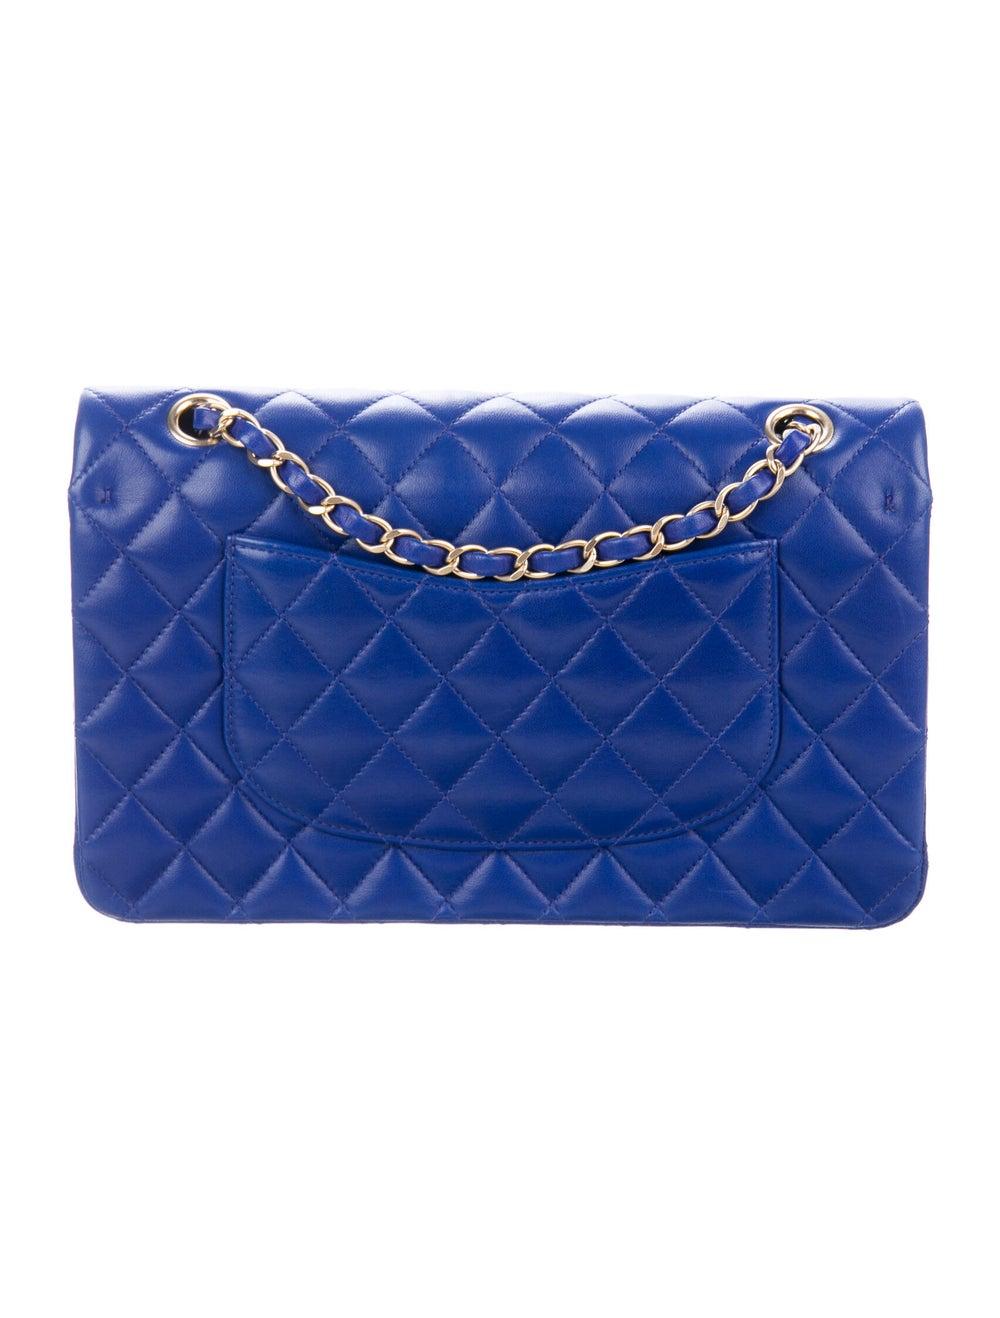 Chanel Medium Classic Double Flap Bag Blue - image 4